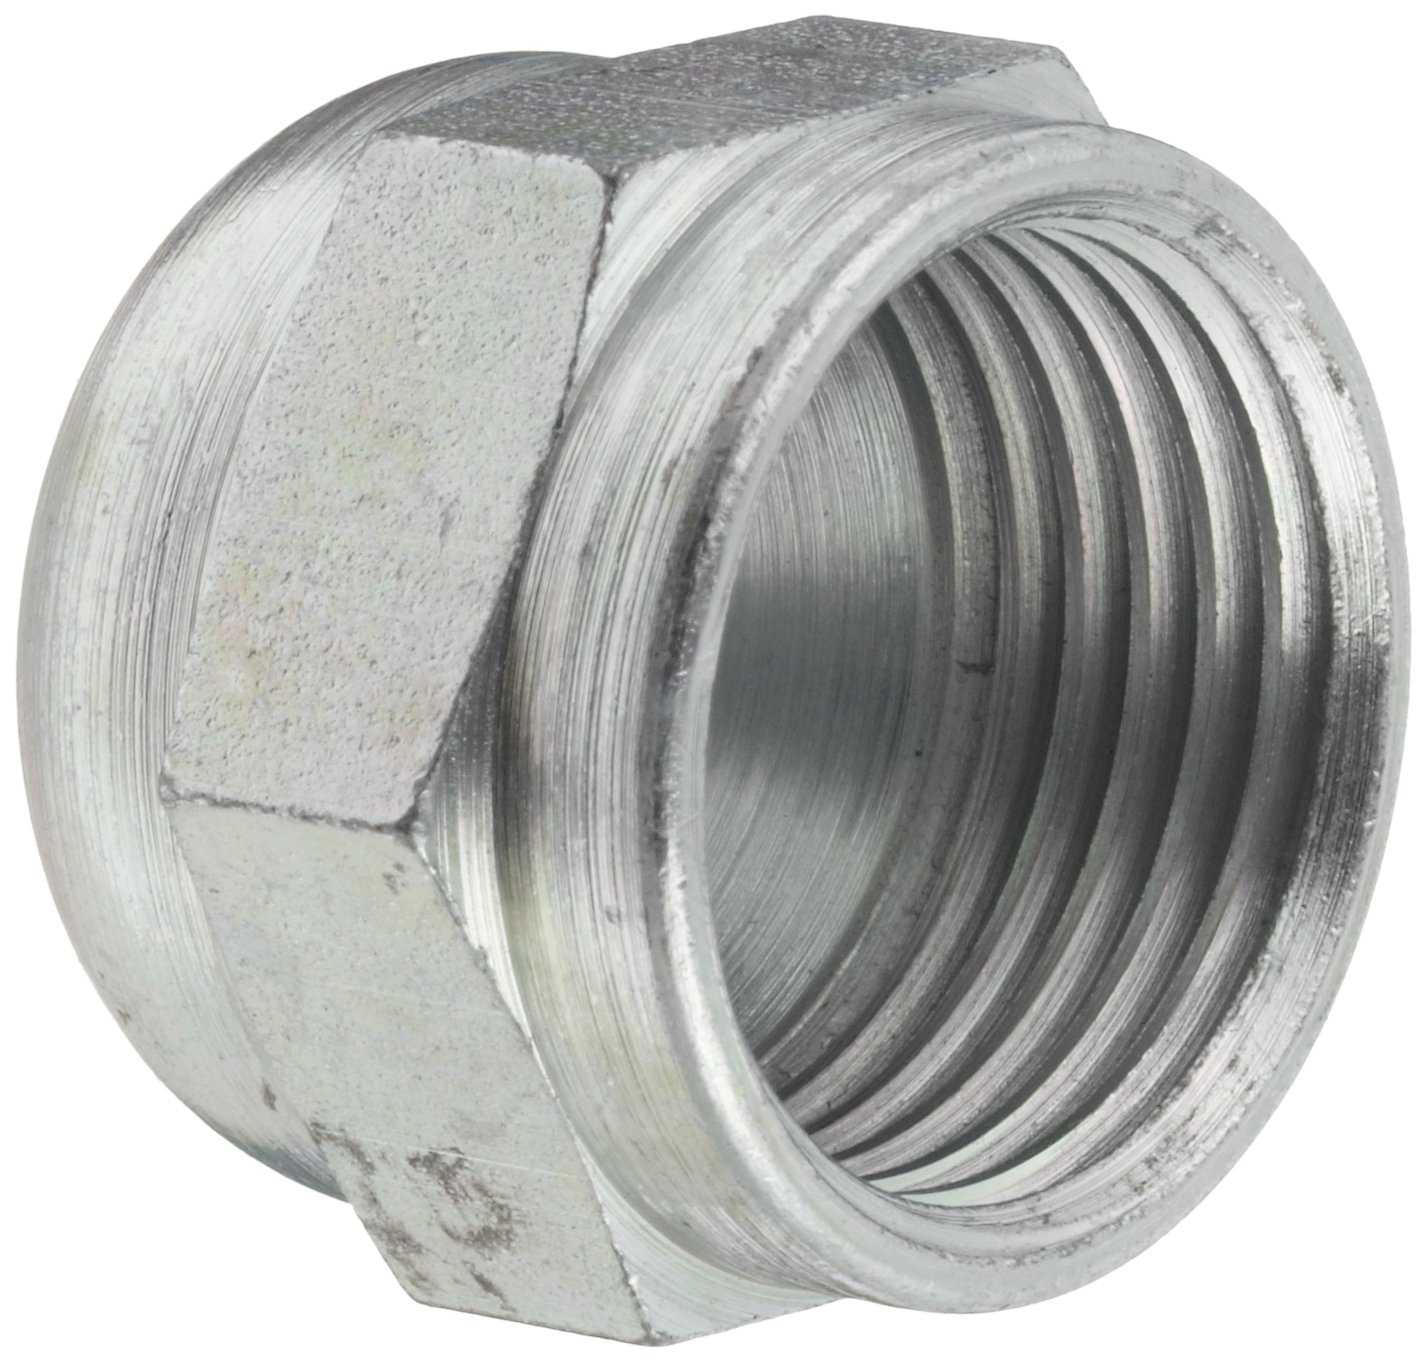 1-1//2 x 2-1//2 10 lb. AQUATROL 743HH-M2L-225 Series 743 Safety Relief Valve 225 psi